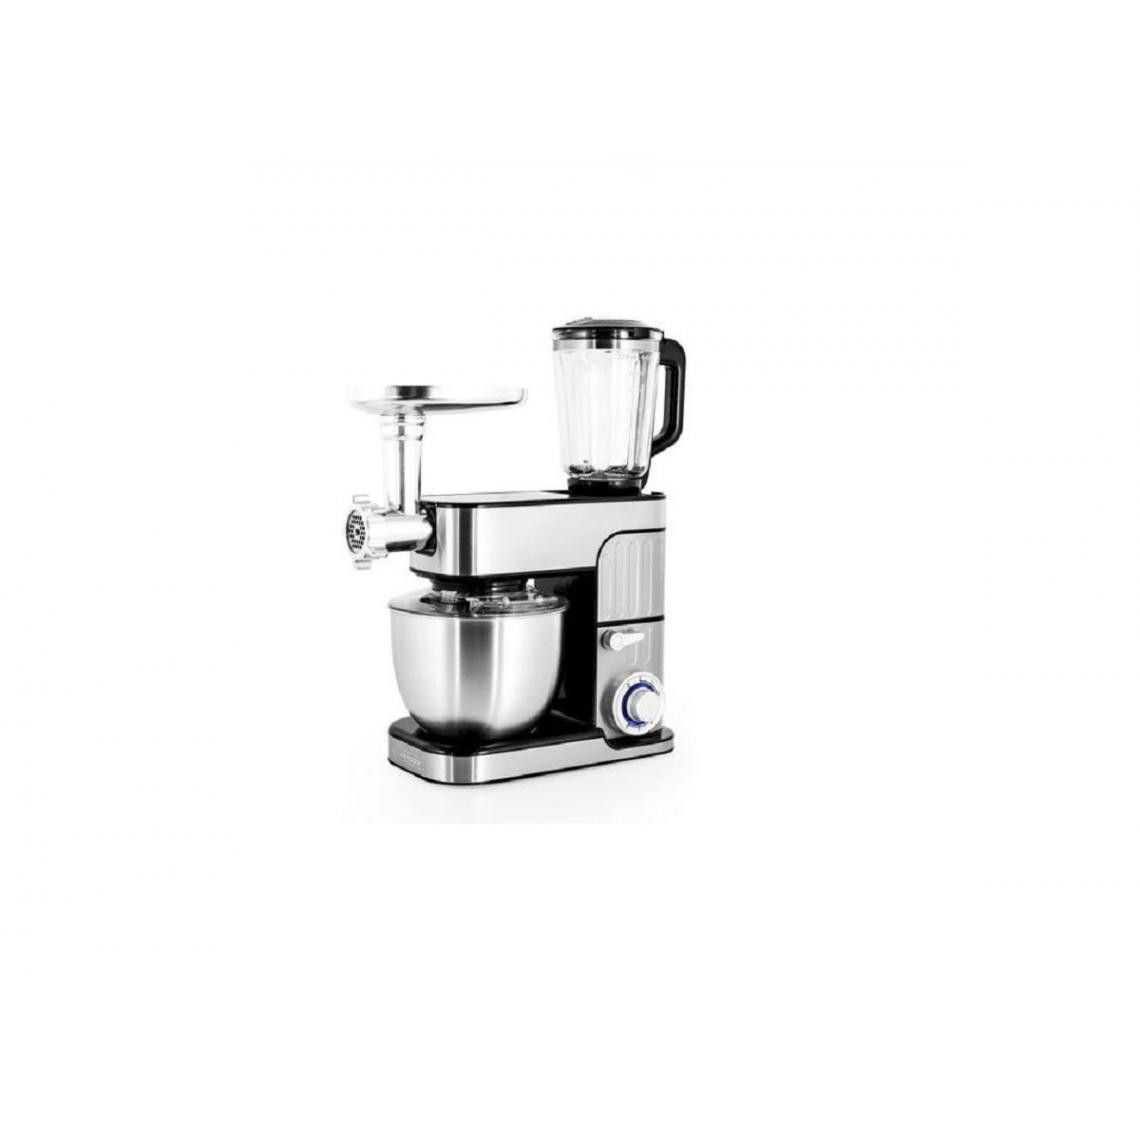 Kitchencook Robot pétrin multifonction Antara Pro - 5.5L - 3 en 1 - 1300W - Inox Gris